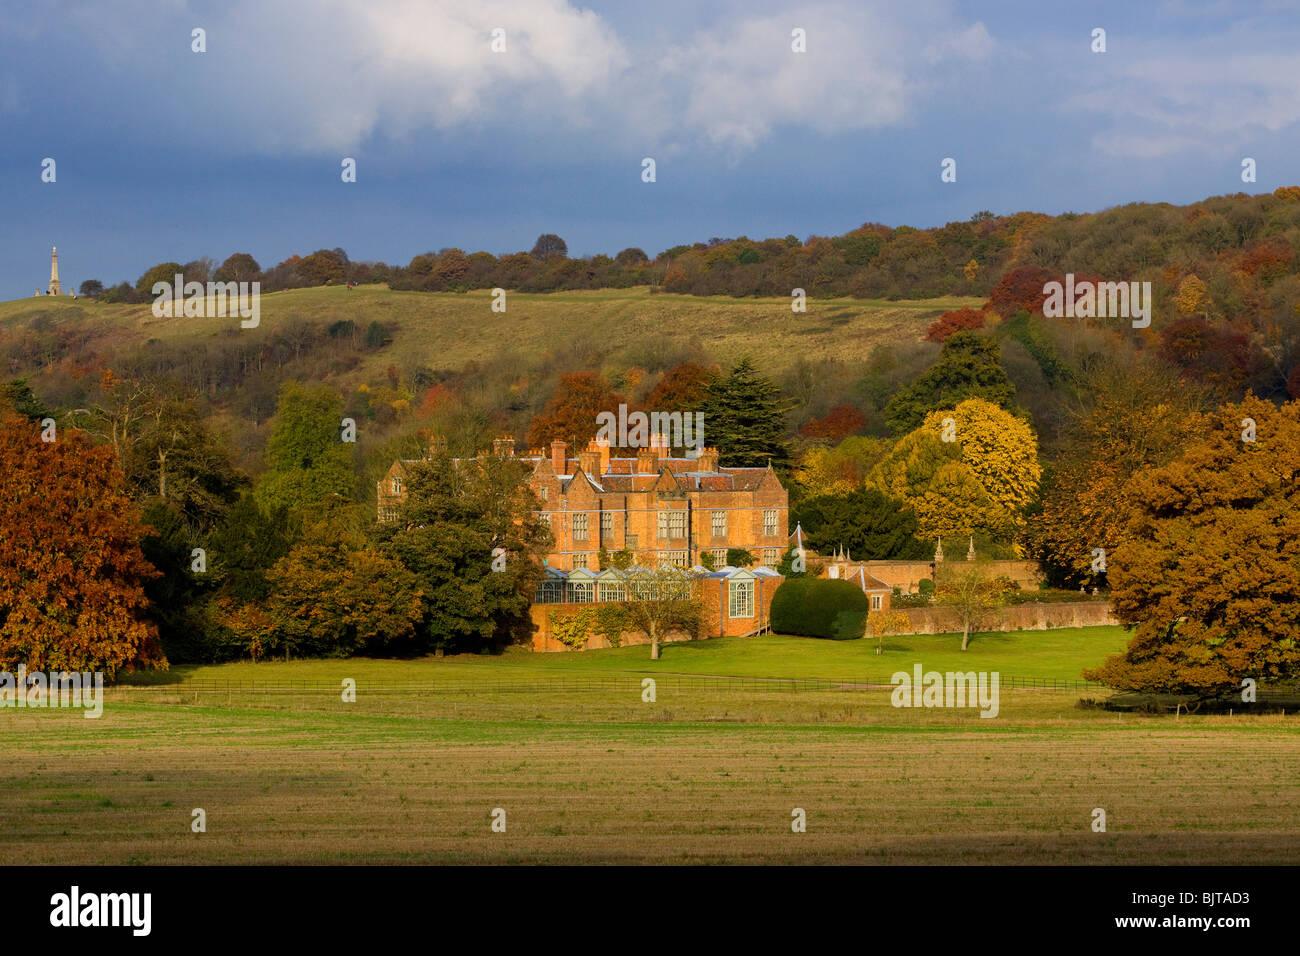 Autumn Chequers Buckinghamshire - Stock Image